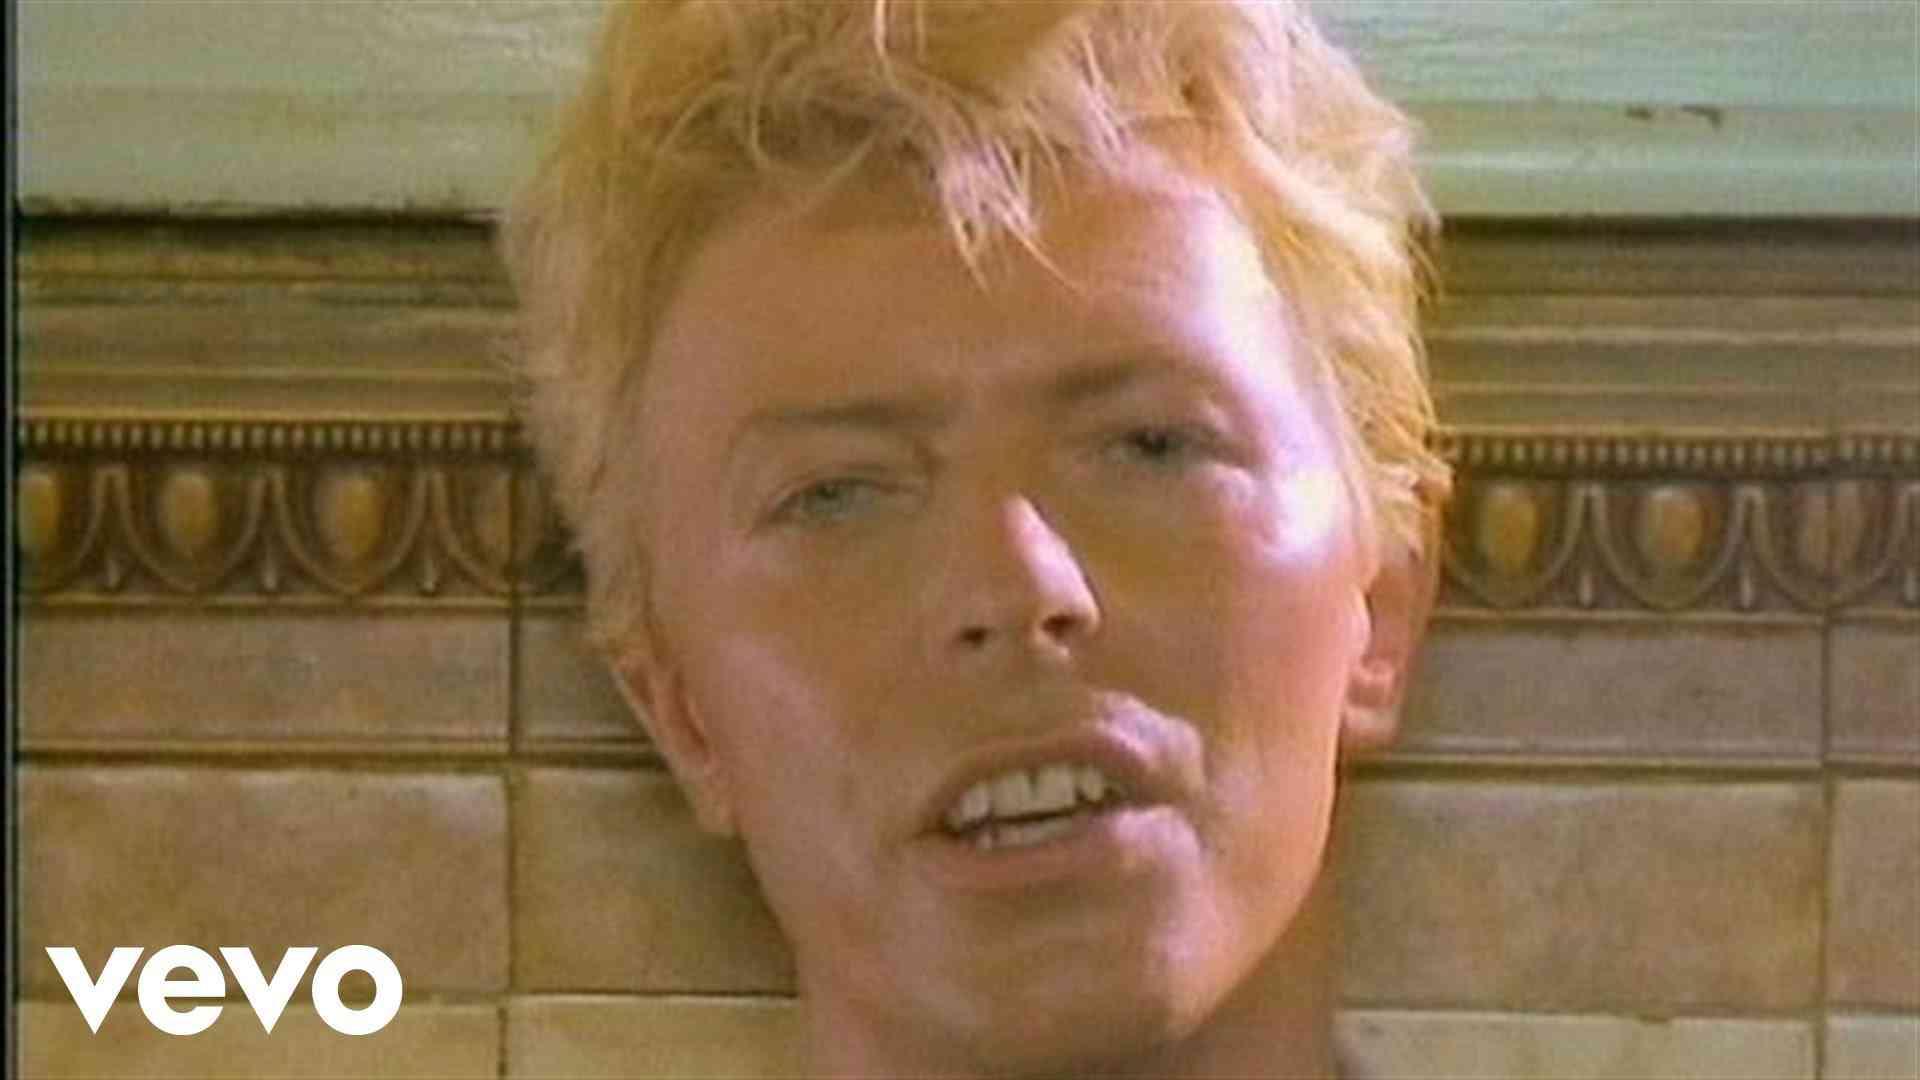 David Bowie - Let's Dance - YouTube